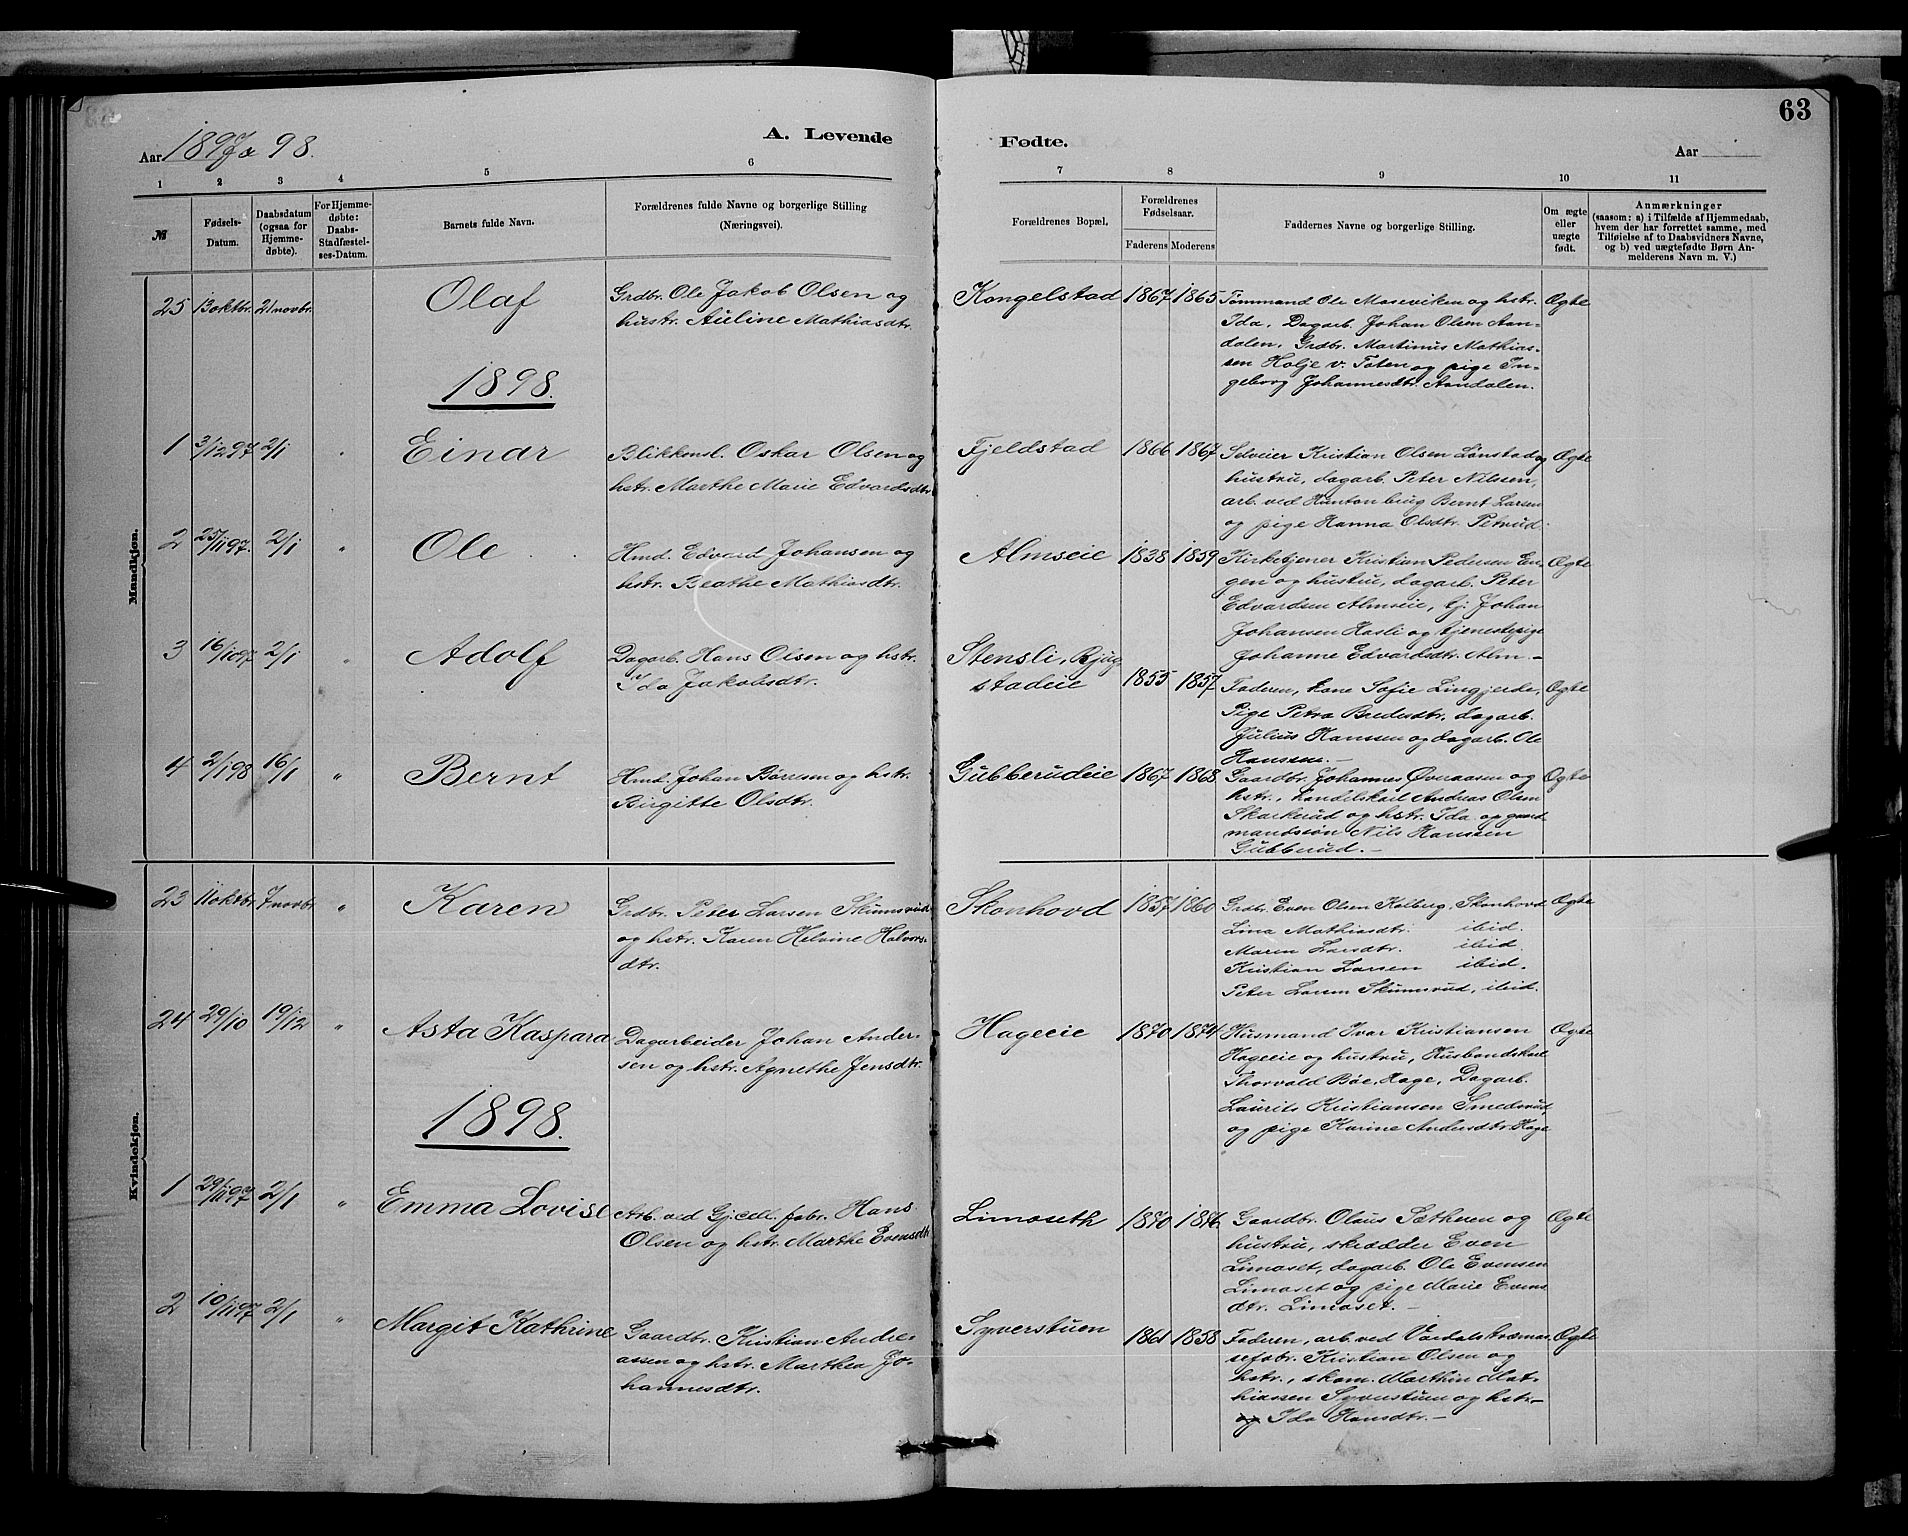 SAH, Vardal prestekontor, H/Ha/Hab/L0008: Klokkerbok nr. 8, 1881-1898, s. 63